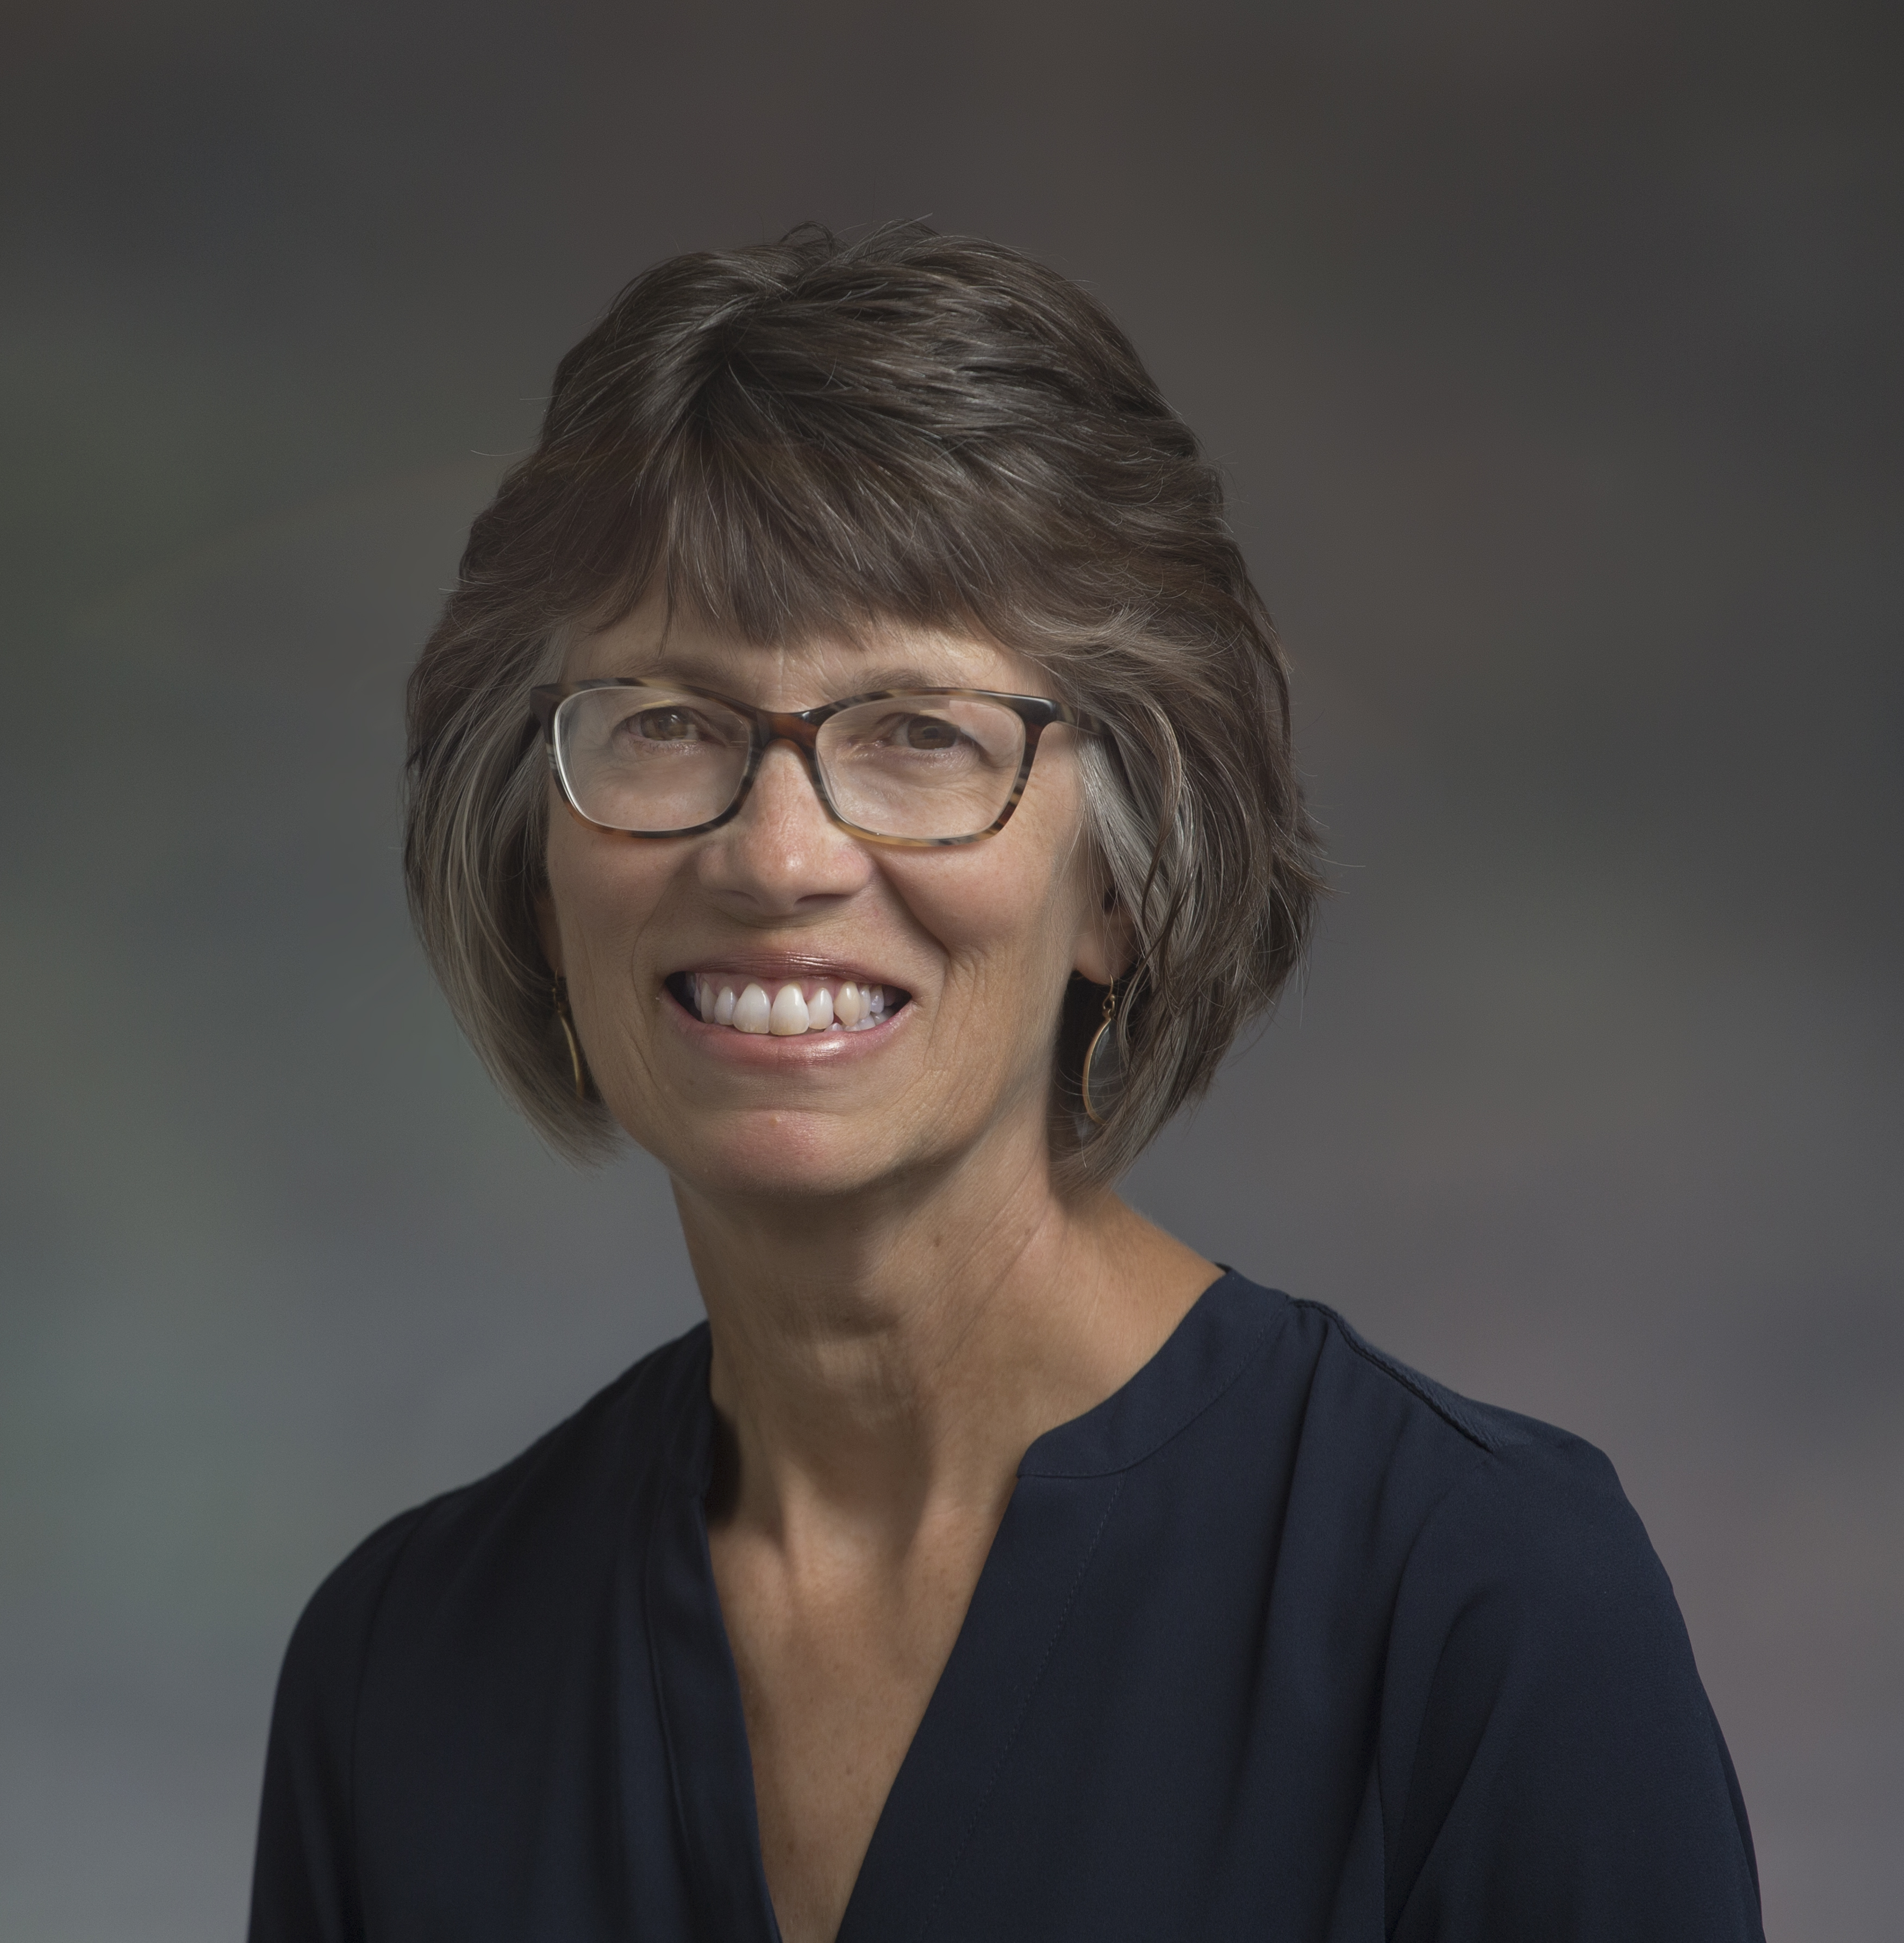 Photo of Mary Pribbenow